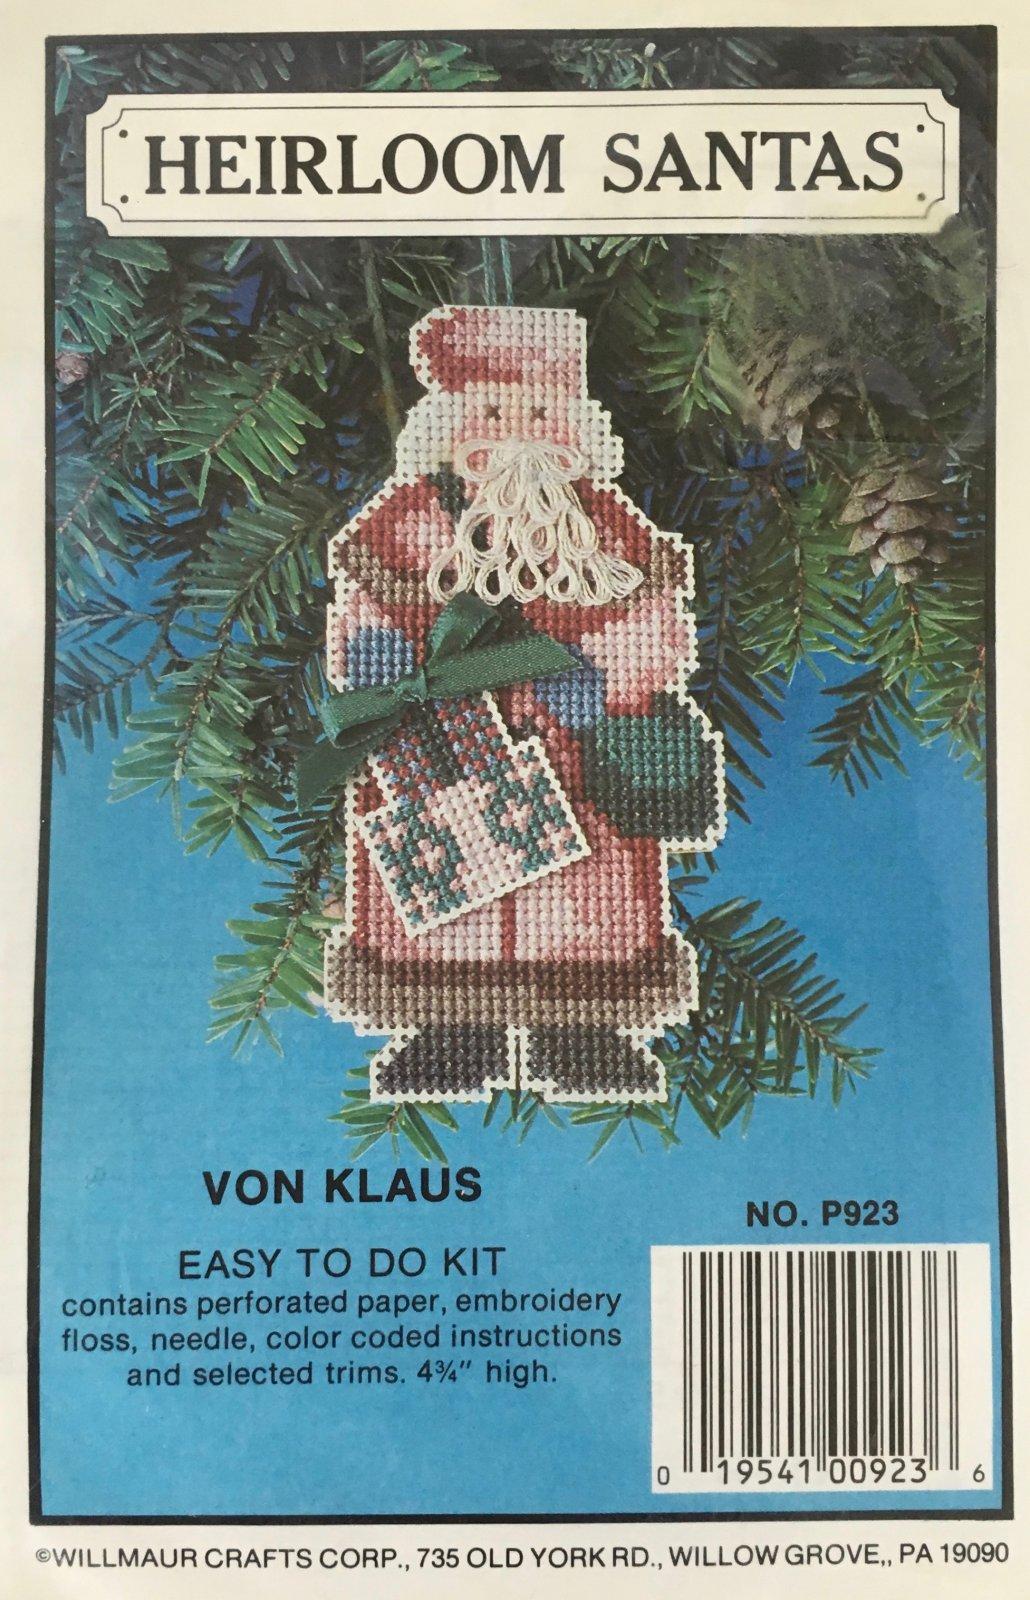 Astor Place: Heirloom Santas Von Klaus Kit P923